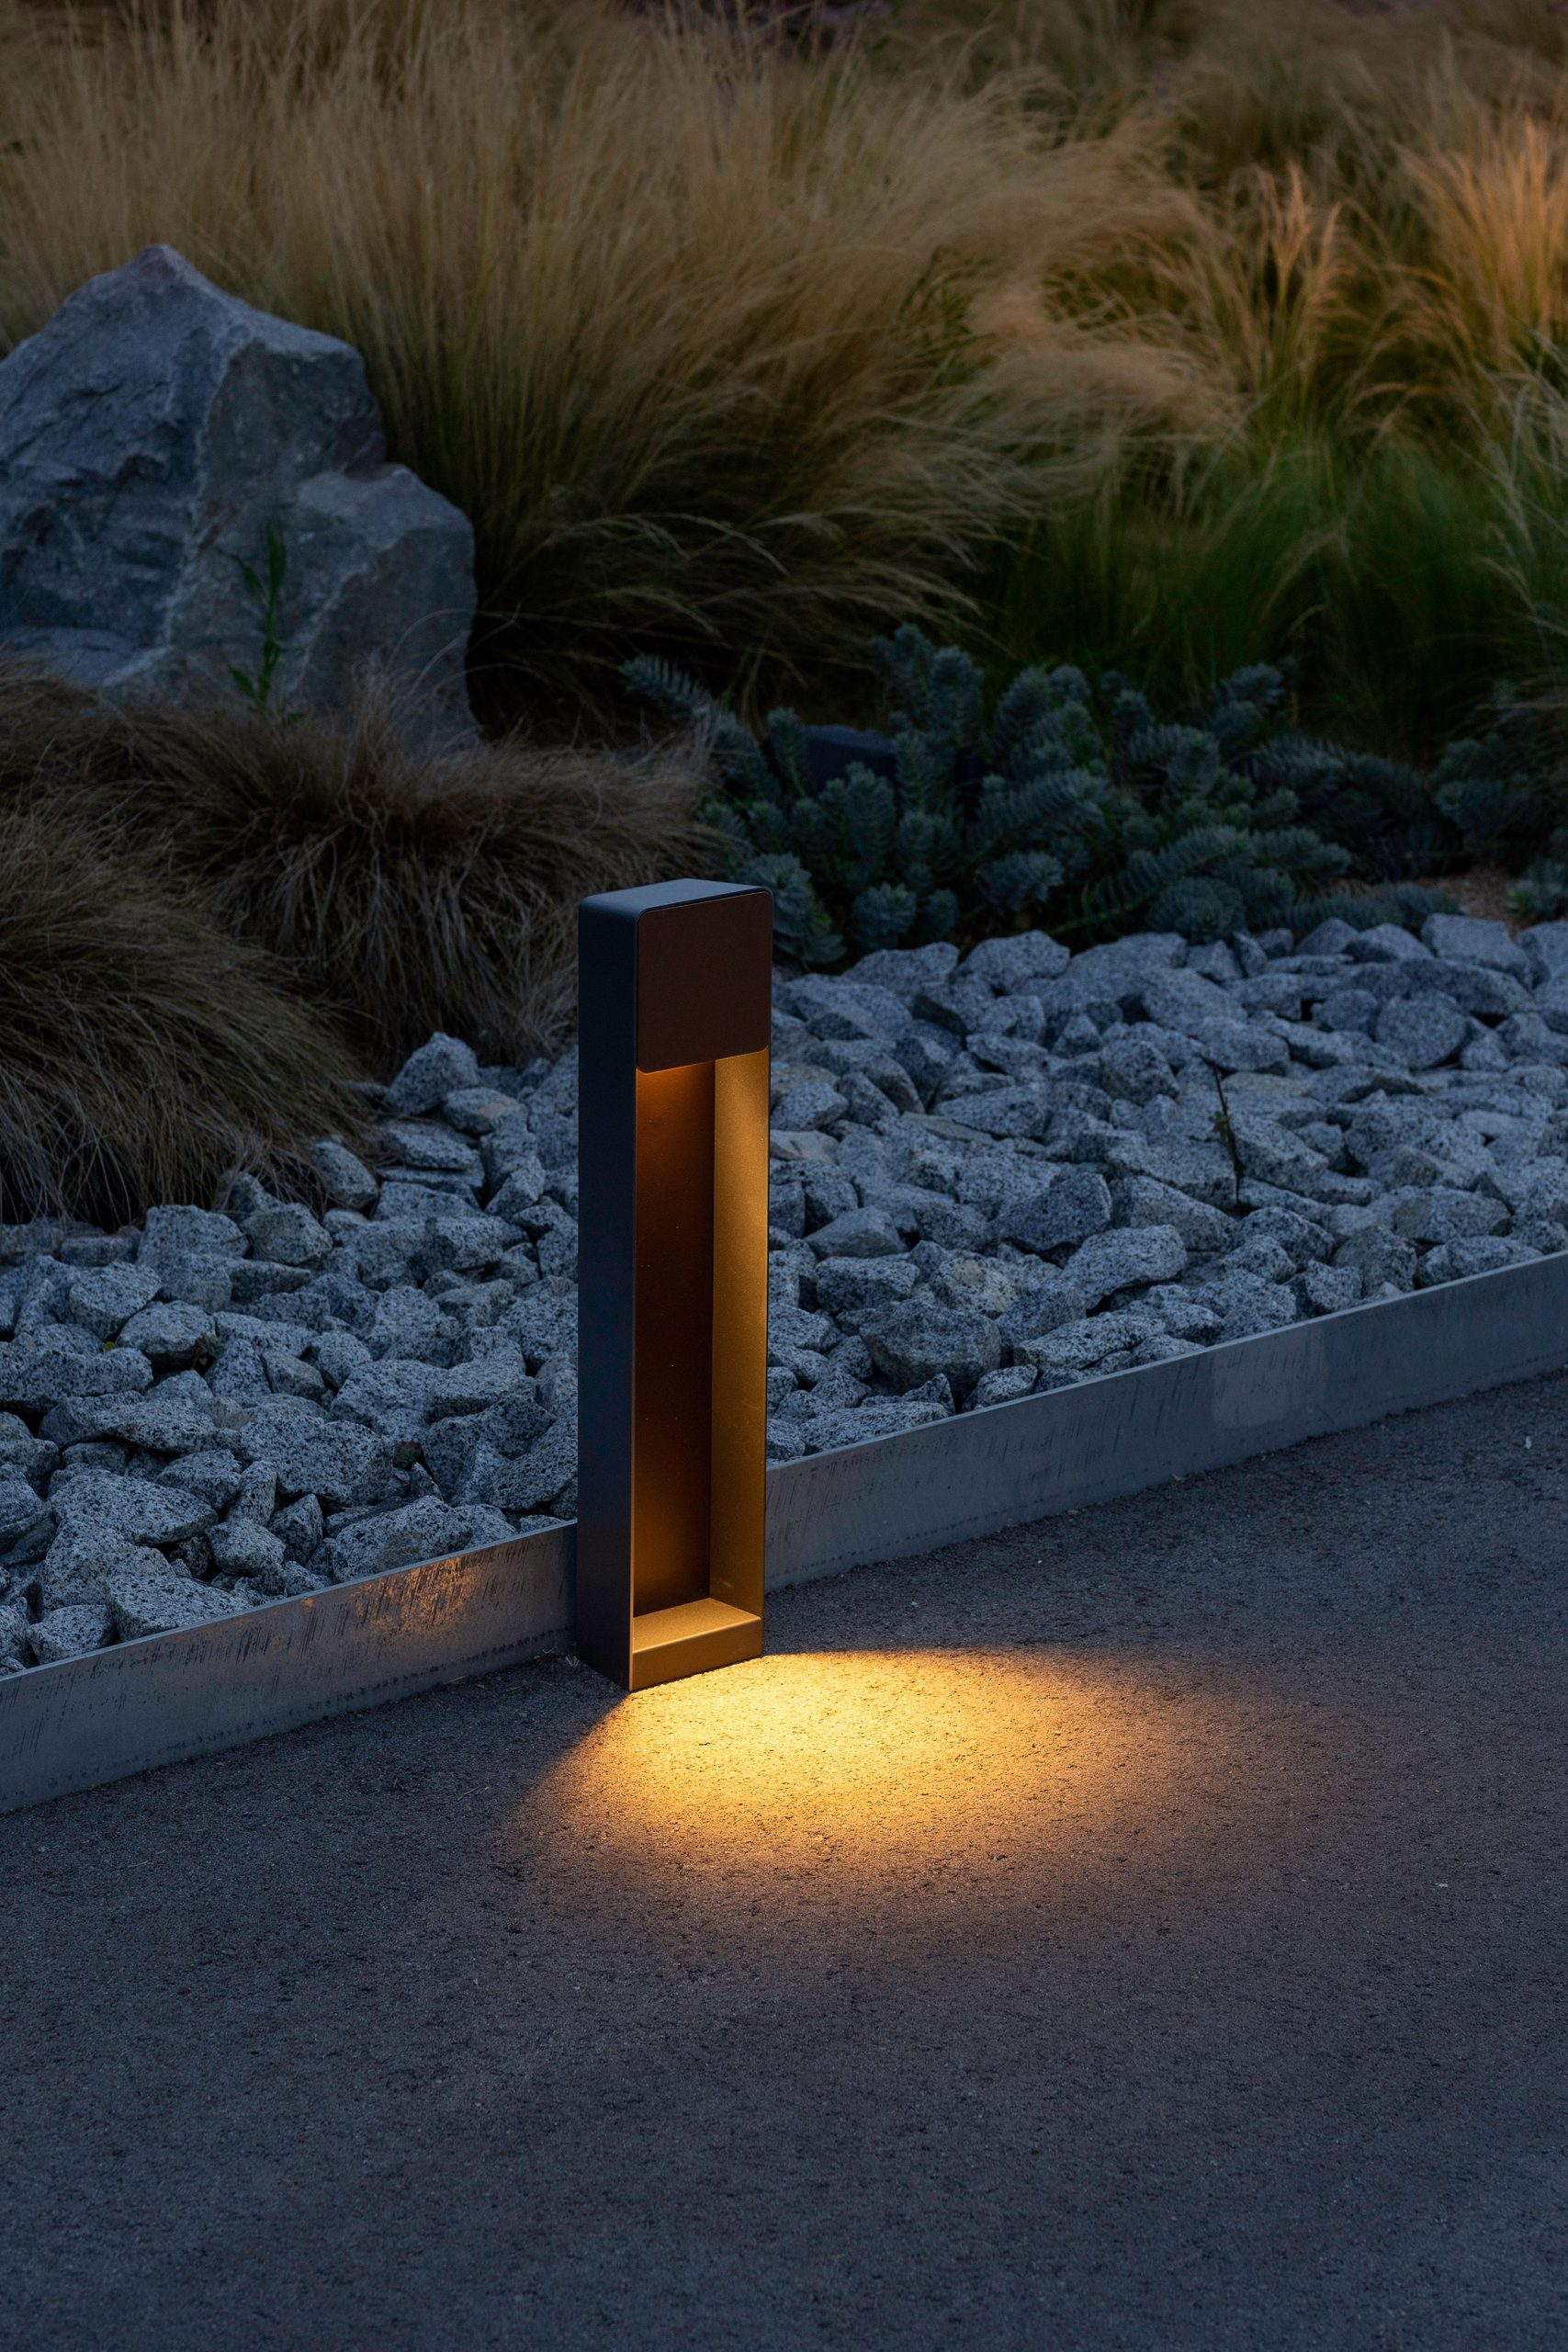 Lab outdoor lamp by Francesc Rife for Marset illuminates a path